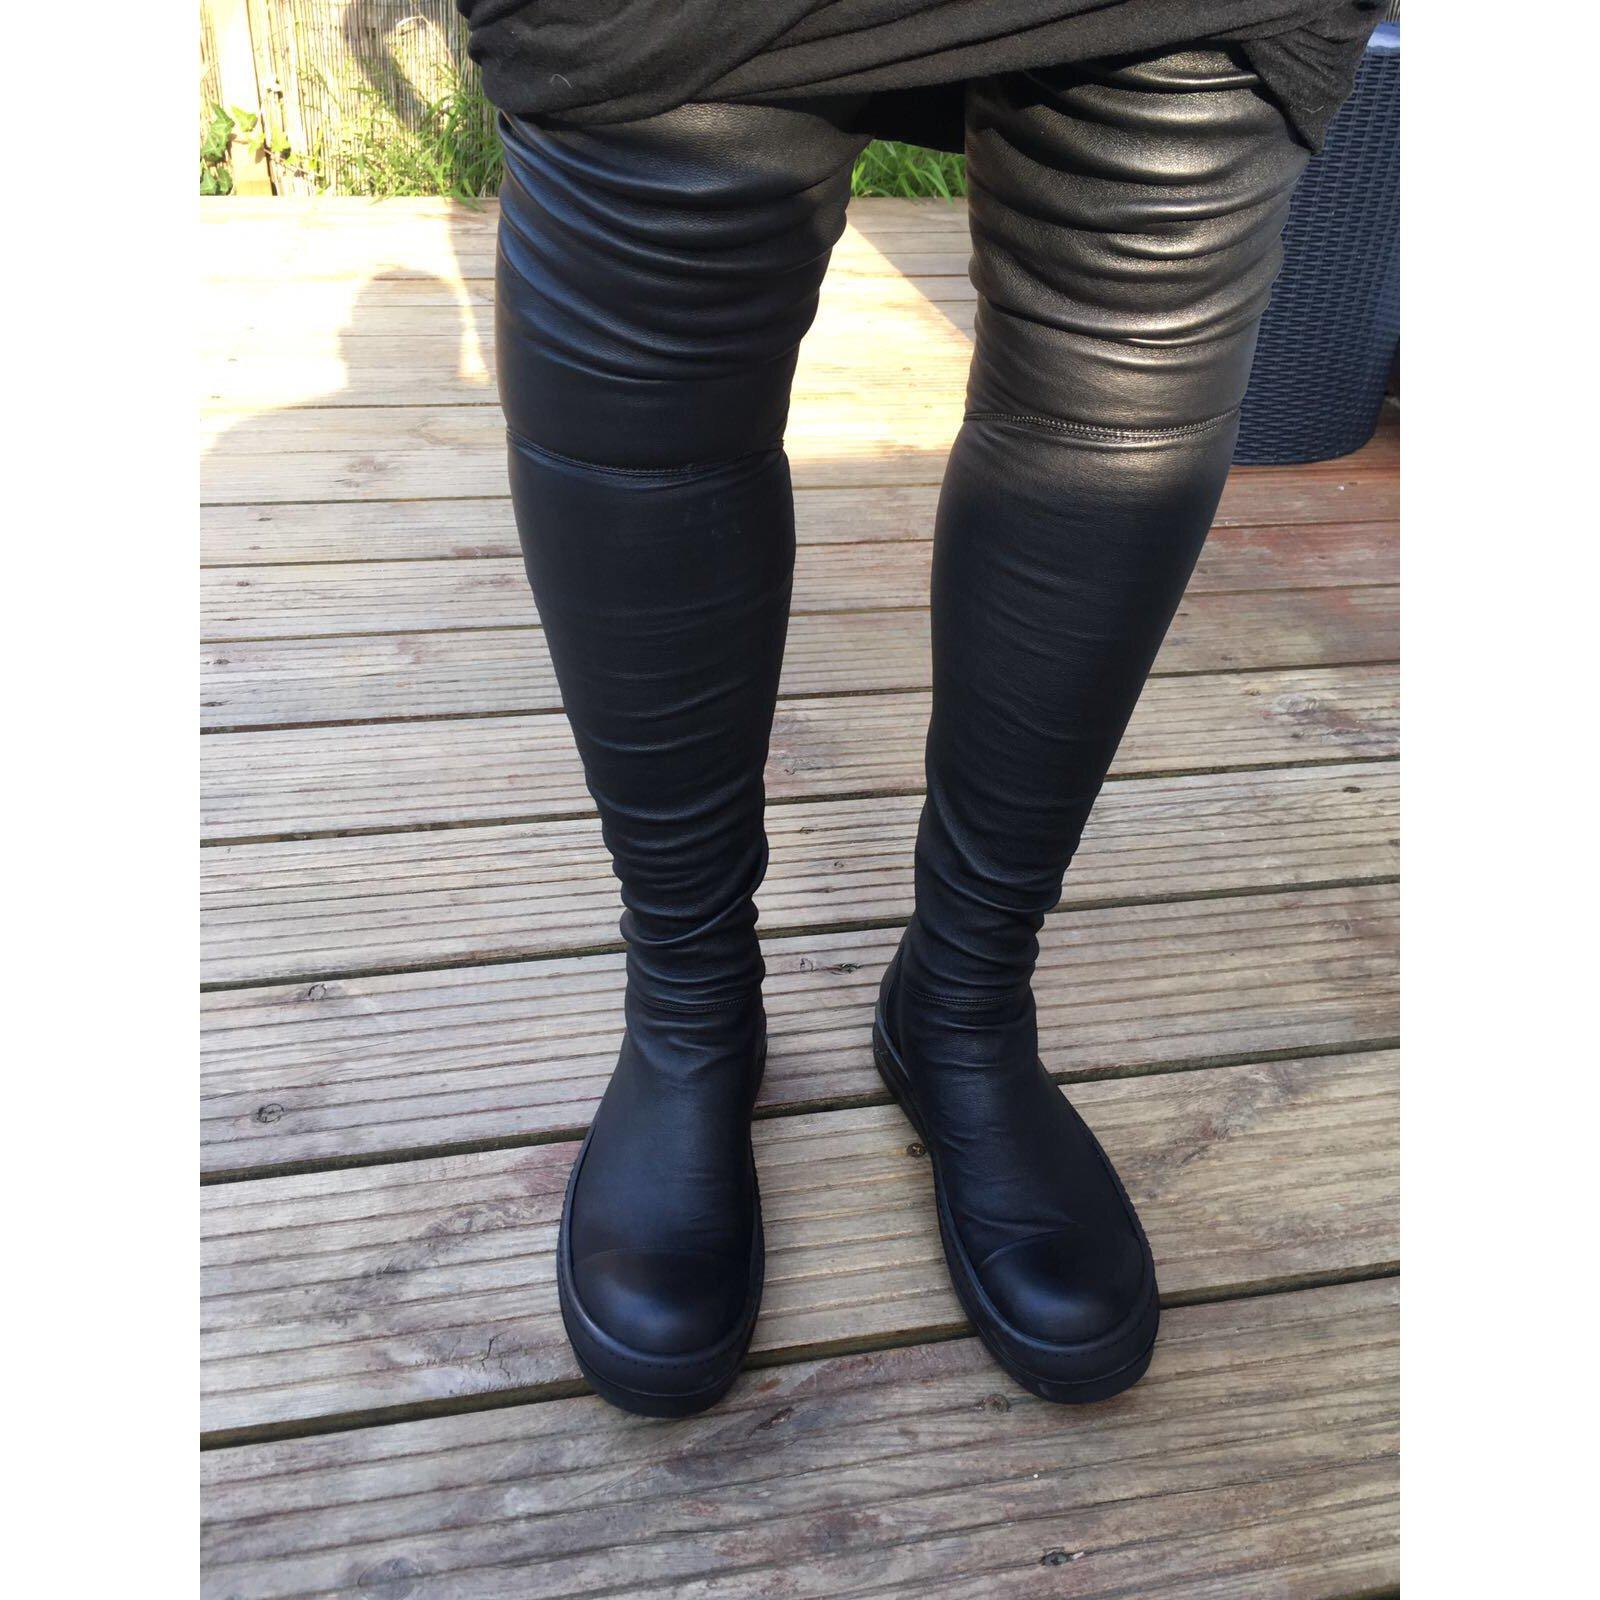 Rick Owens Thigh high sneaker boots